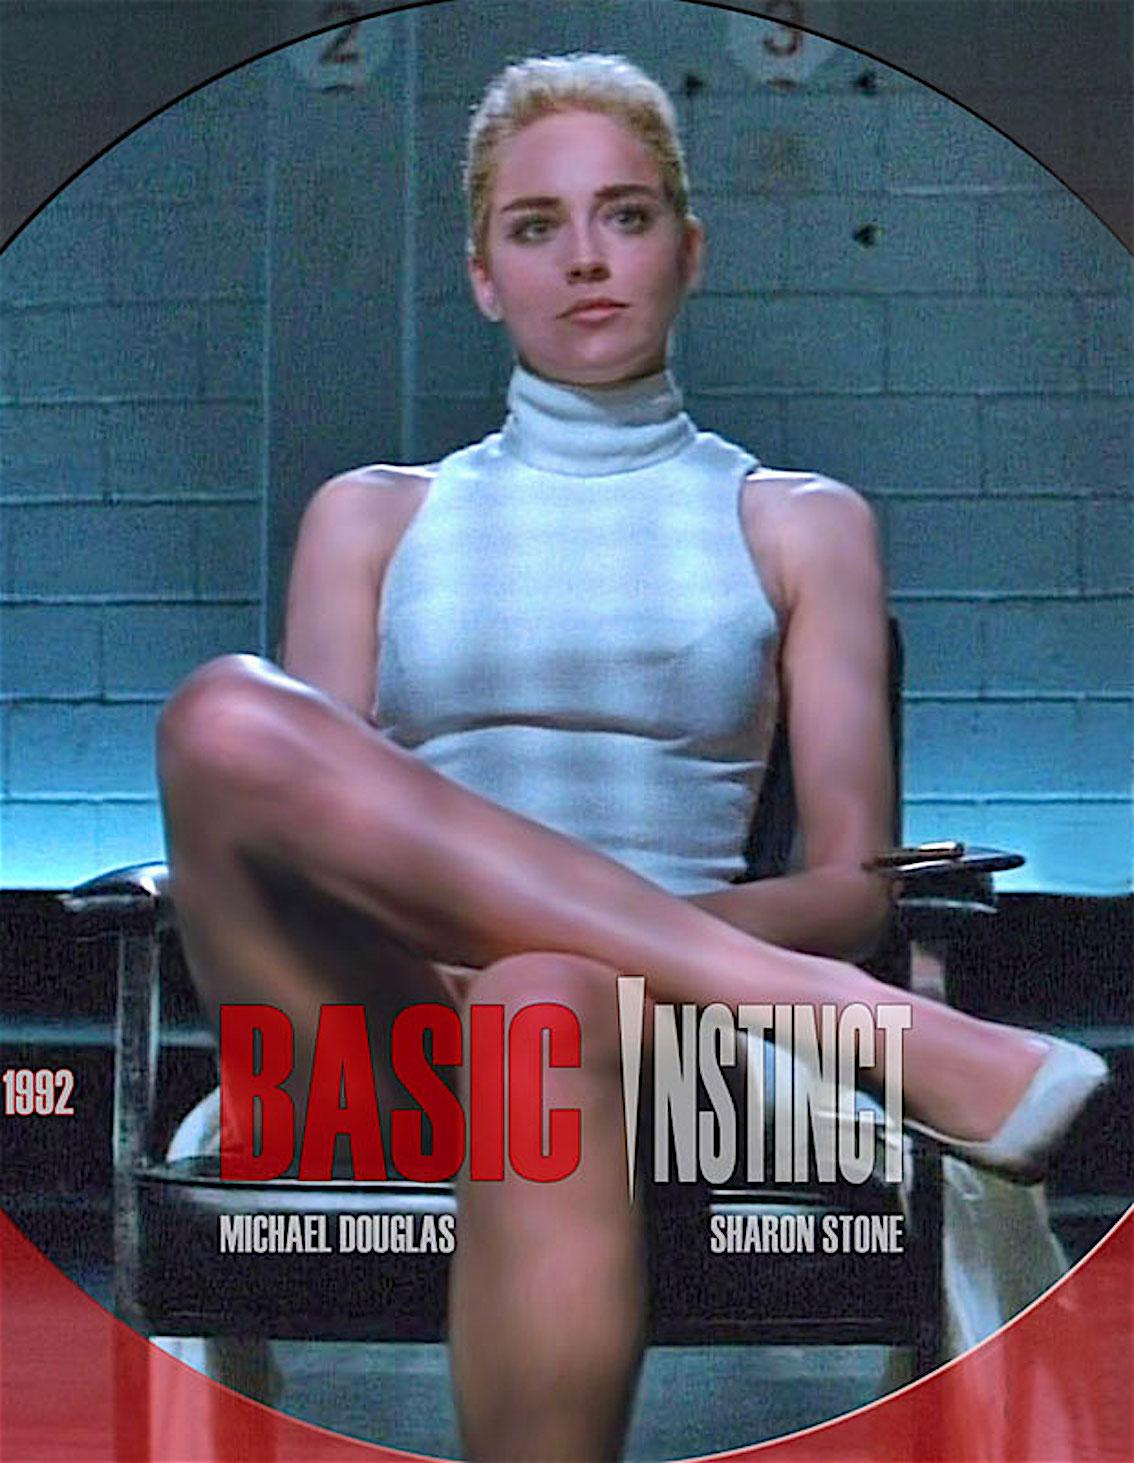 Basic-Instinct_sharon_stone_scena_interrogatorio_1992